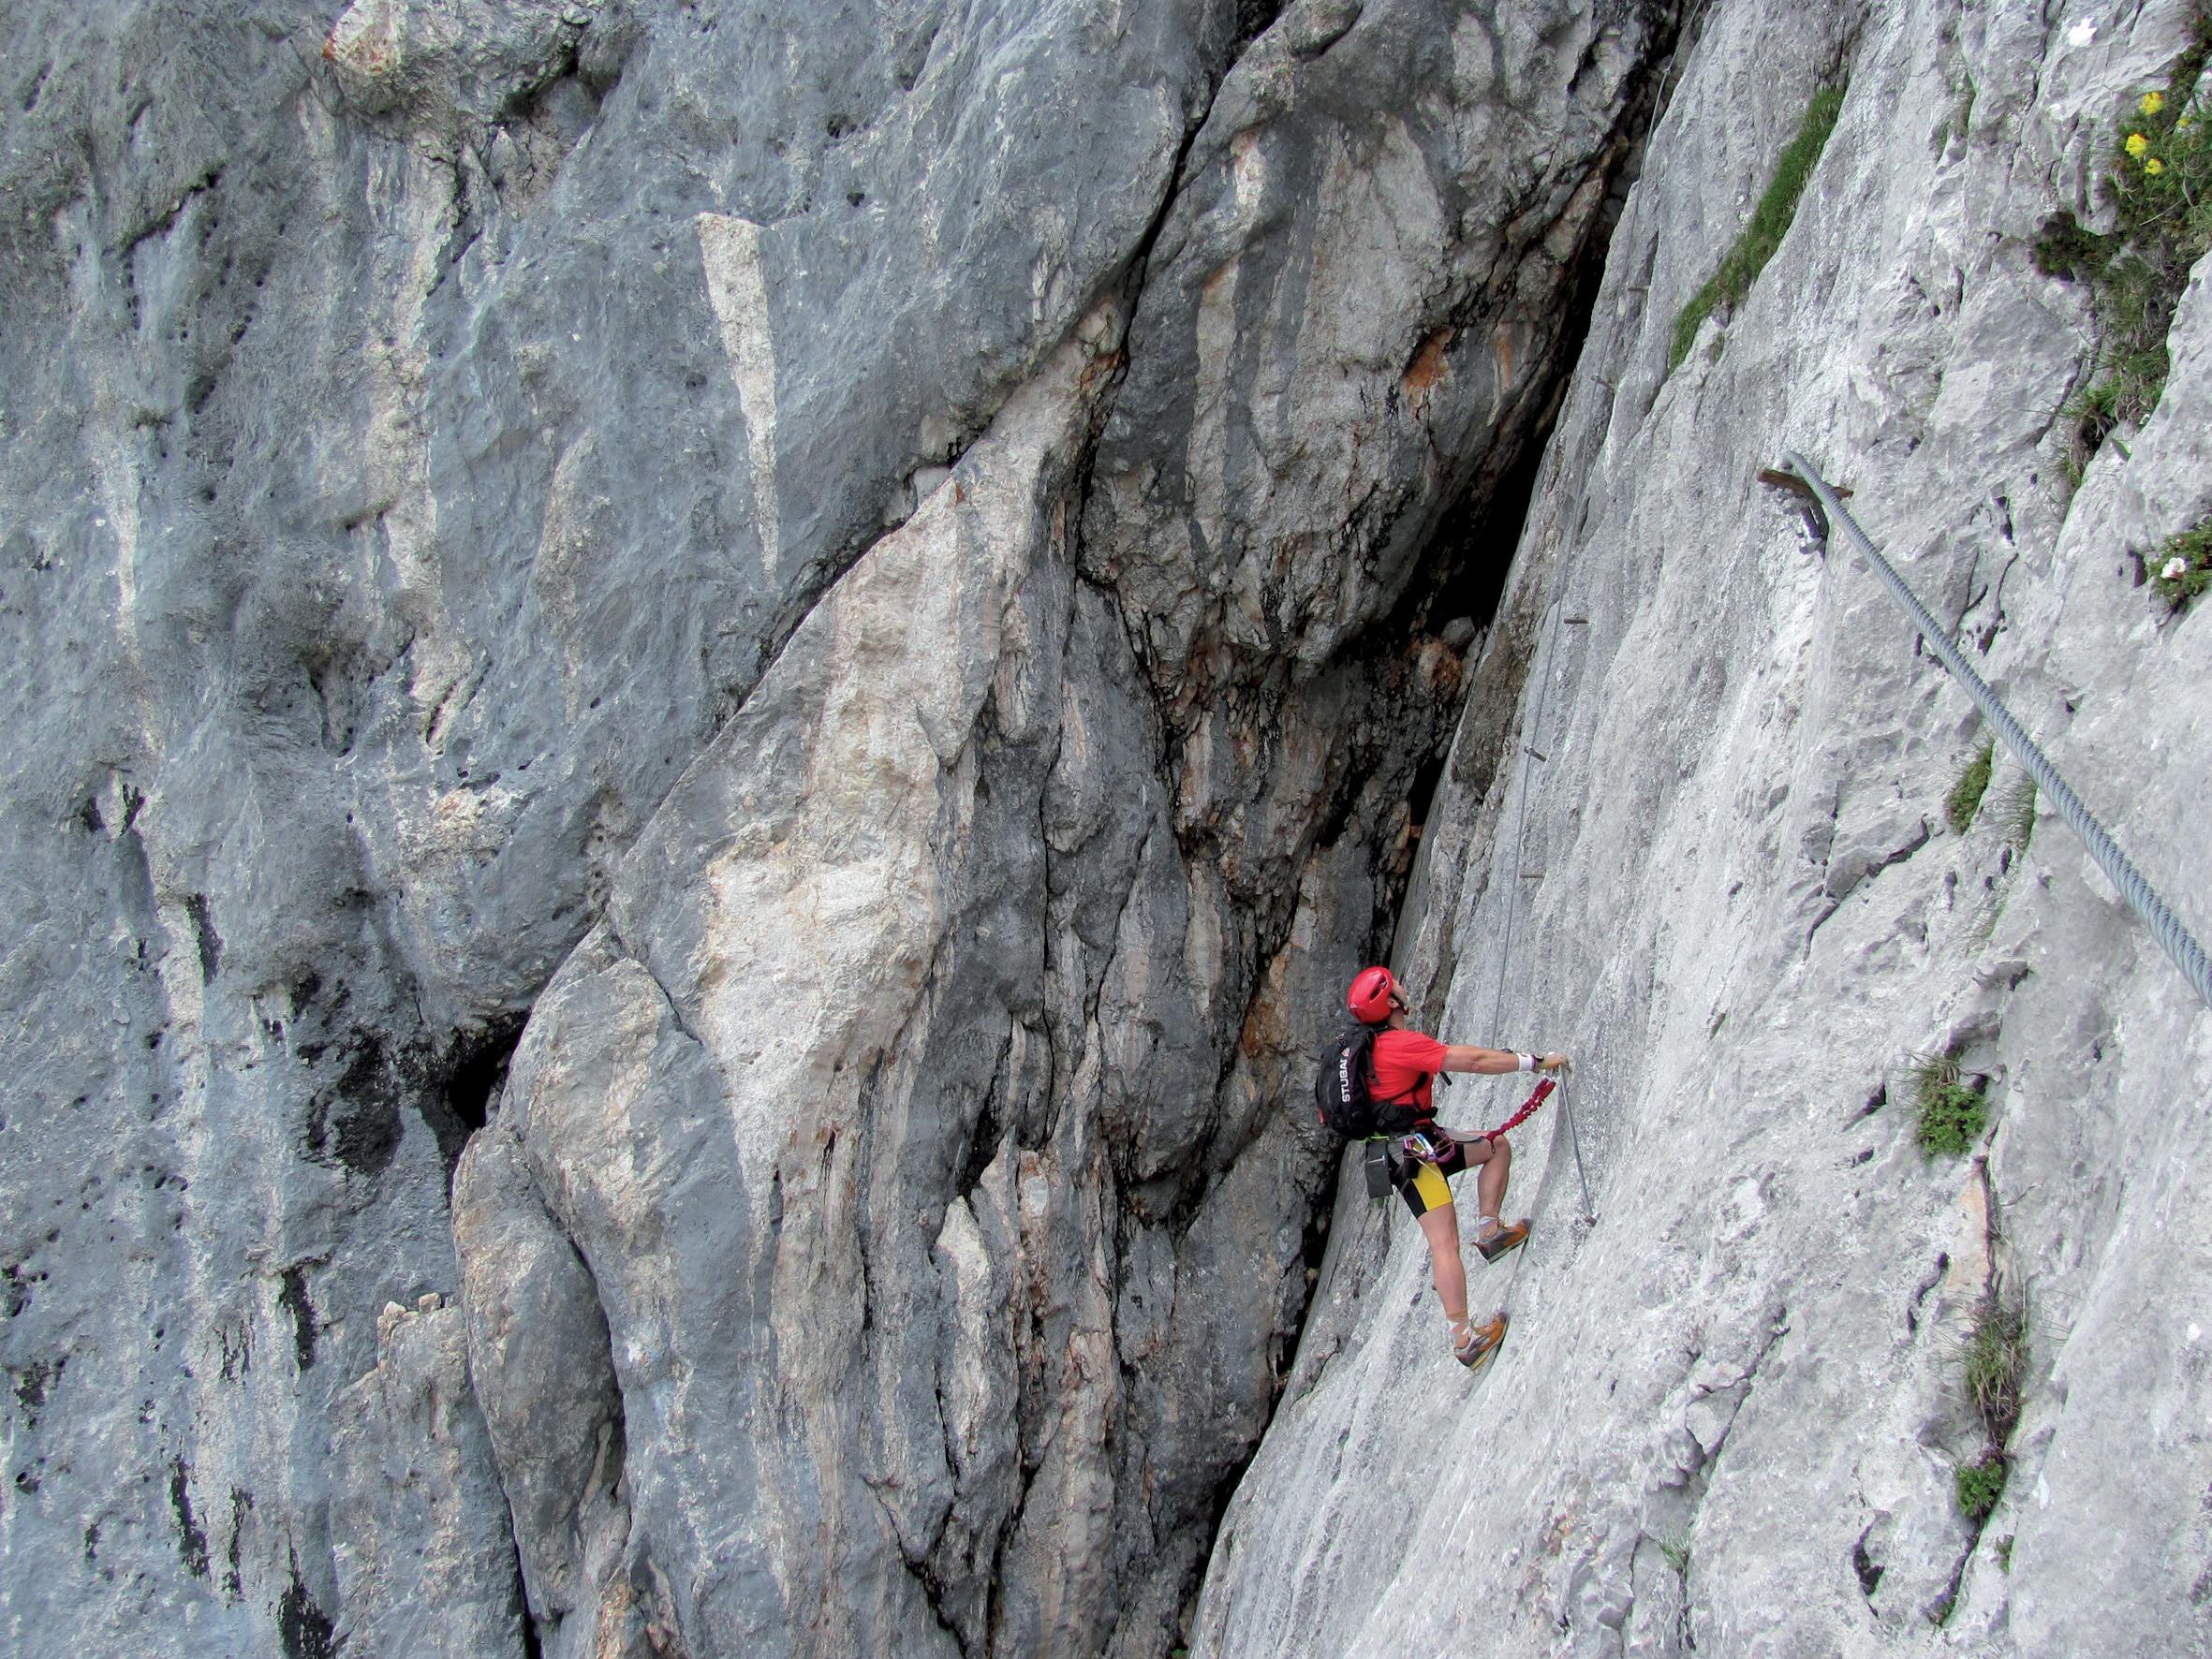 Klettersteig Johann Topo : Klettersteige anna klettersteig km bergwelten